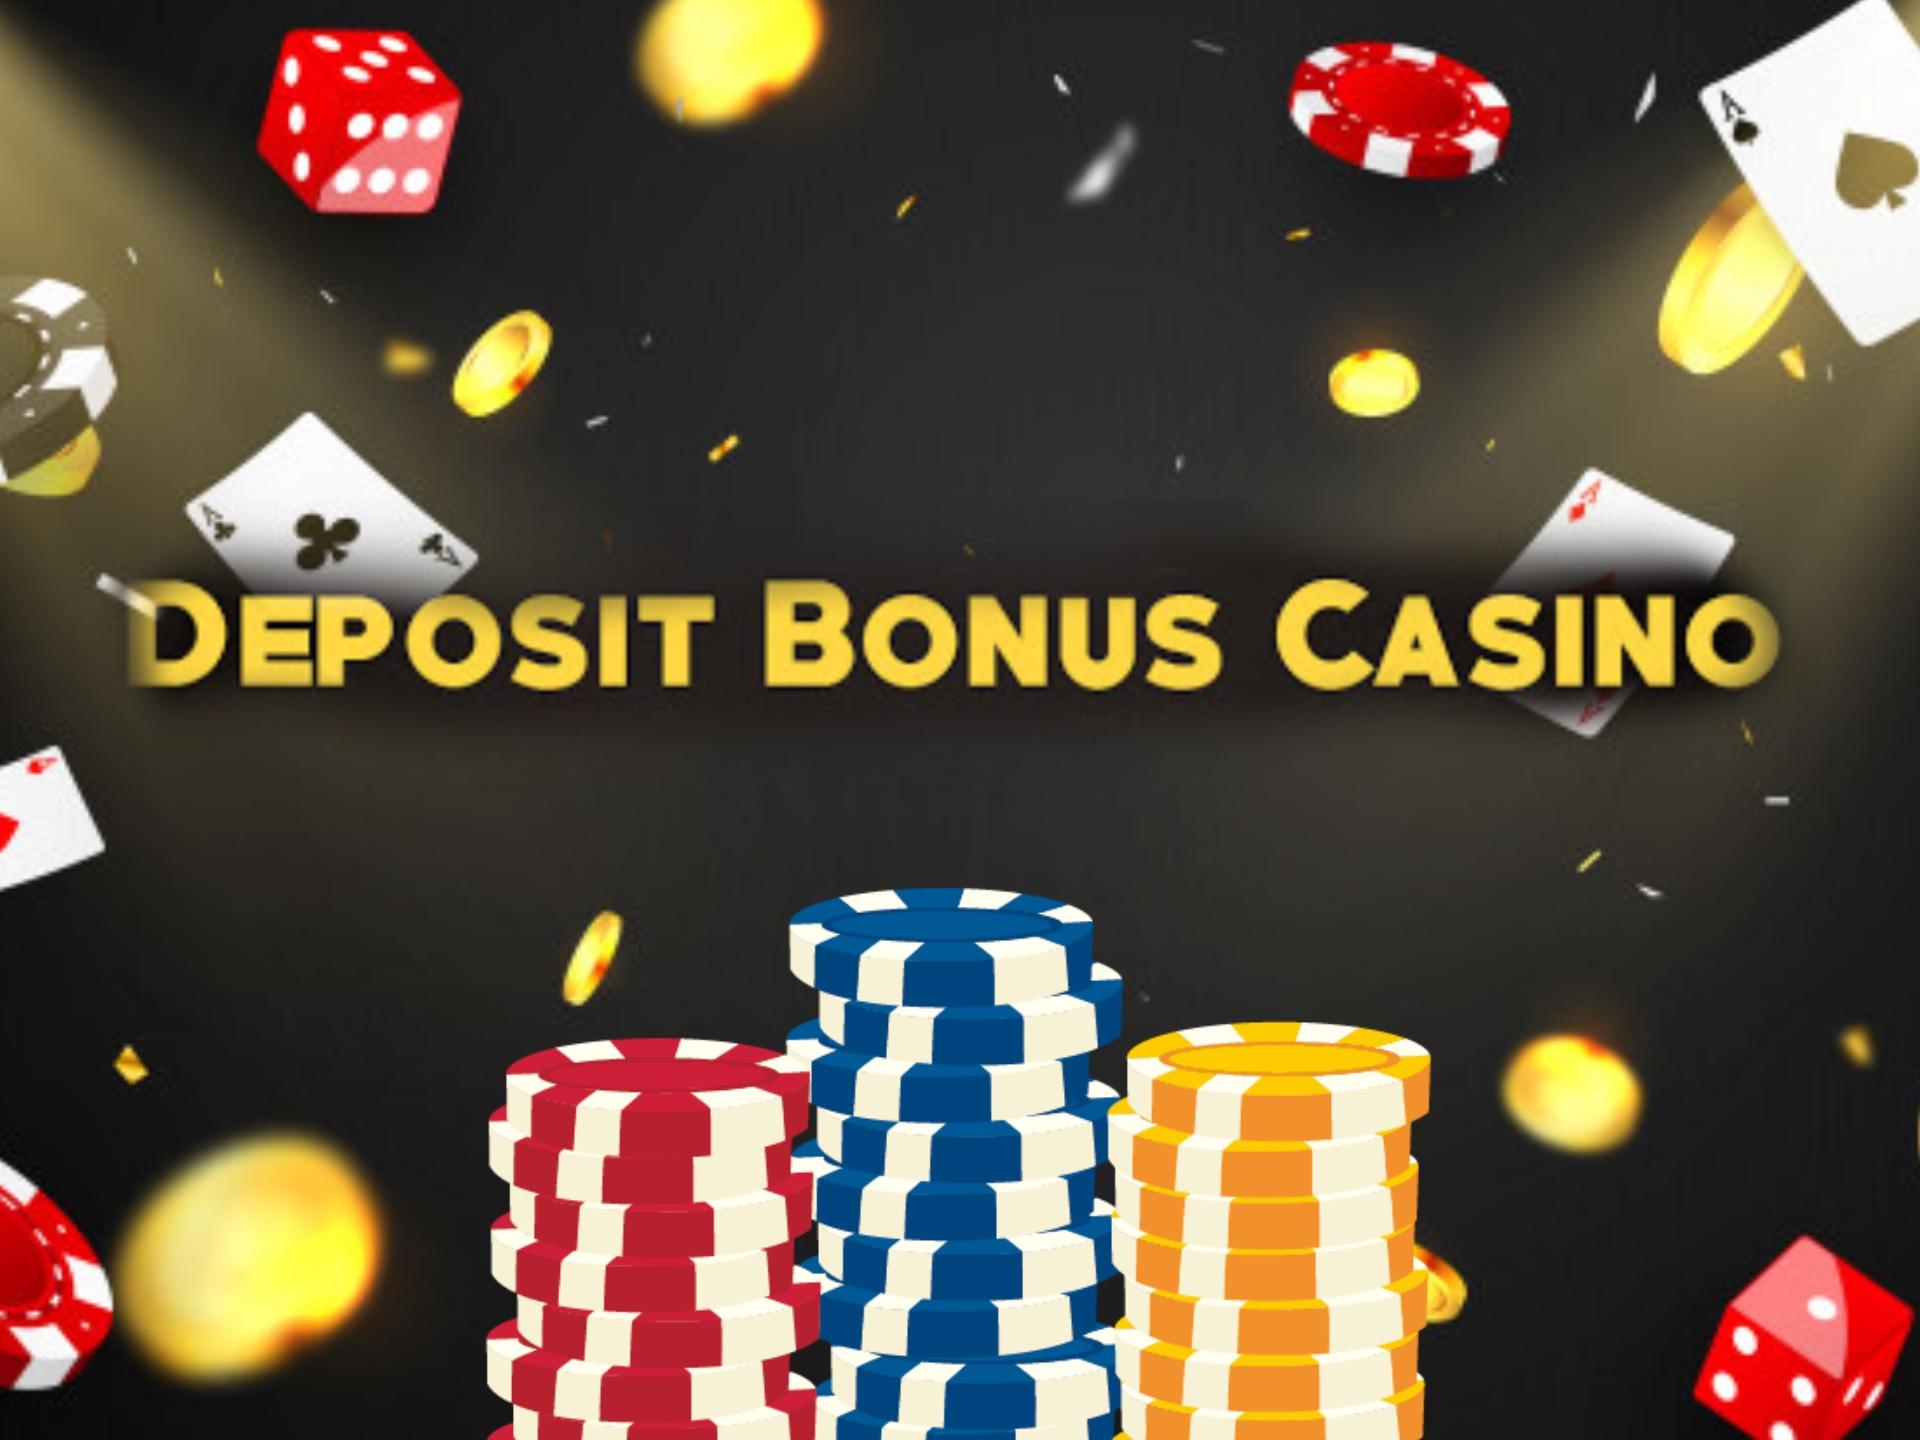 Best online casino bonuses India 2021: types, sign up, codes, no deposit,  free spins